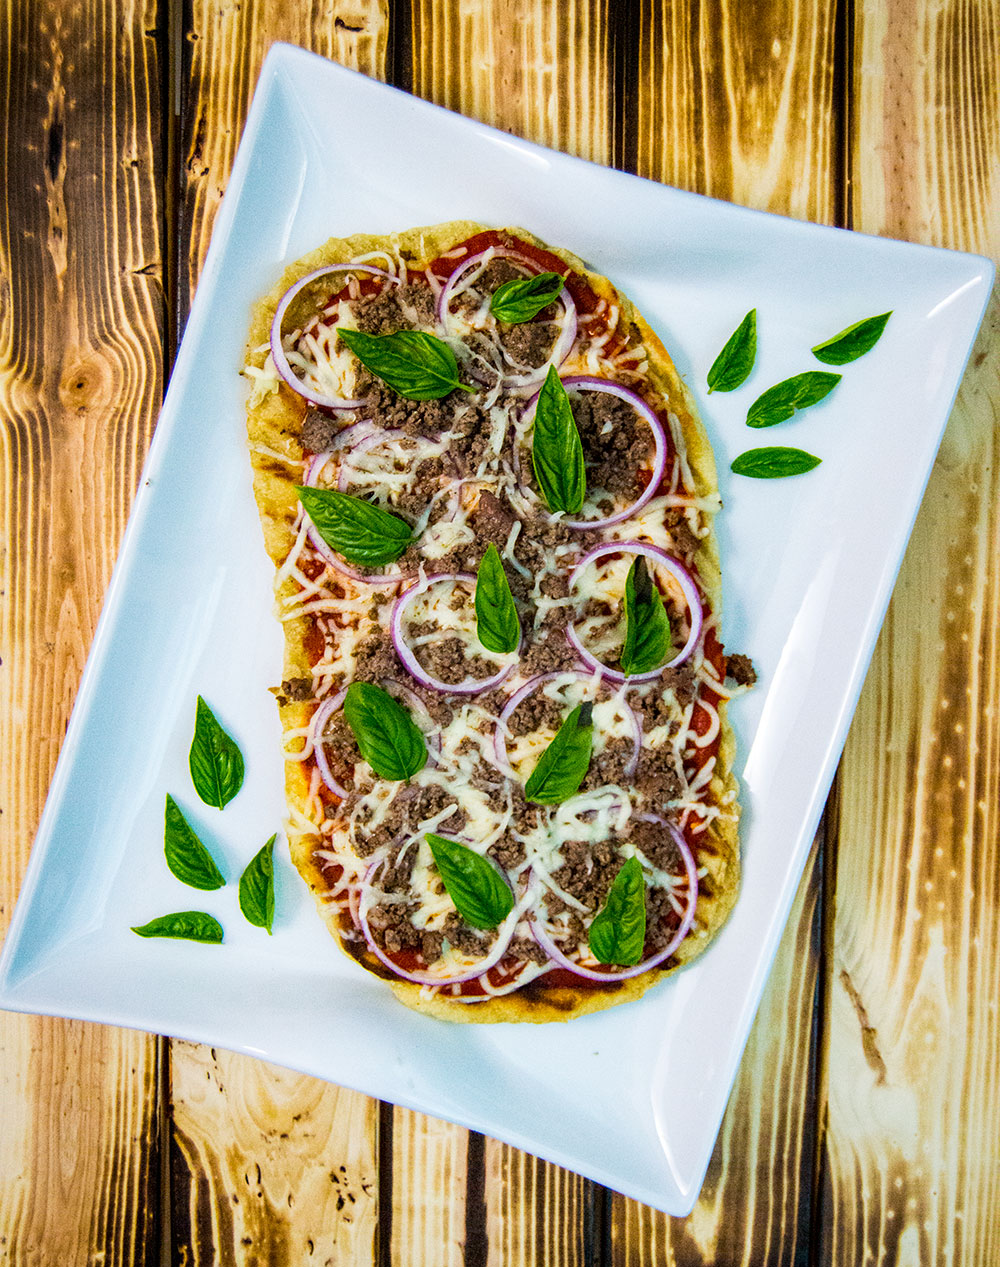 bison-pizza